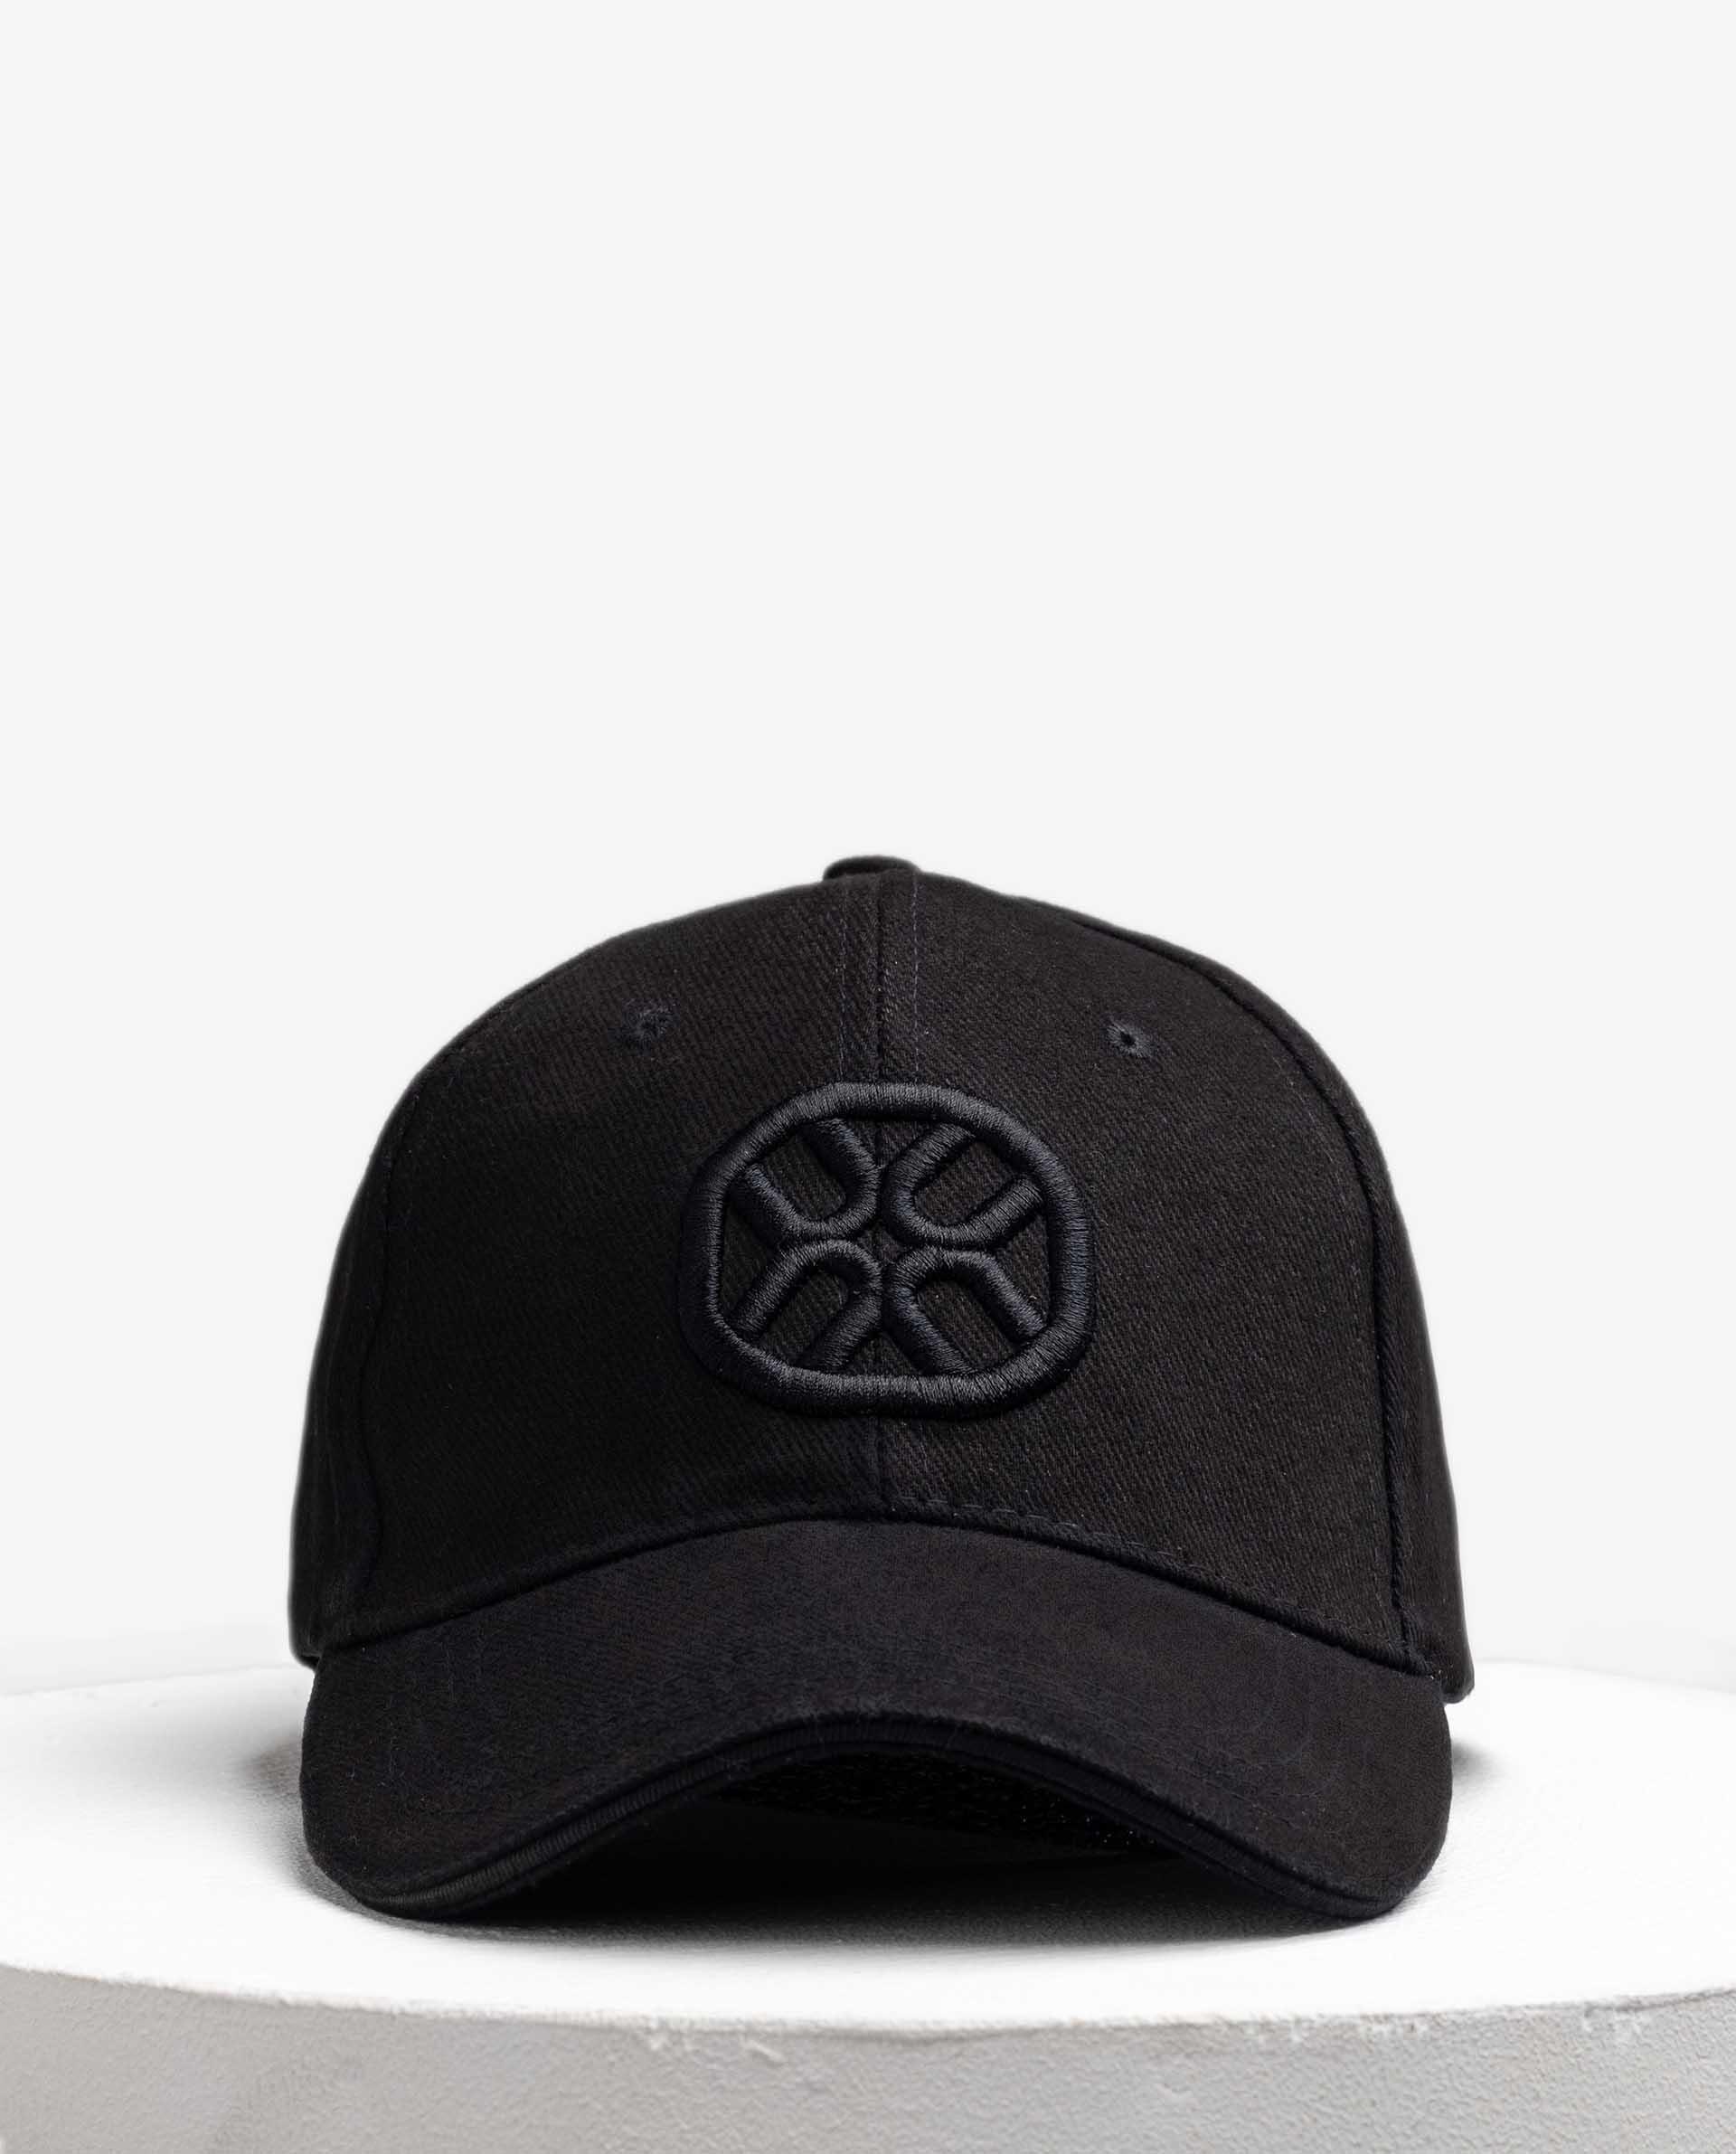 Unisa Gorras y sombreros GORRA_UNI black